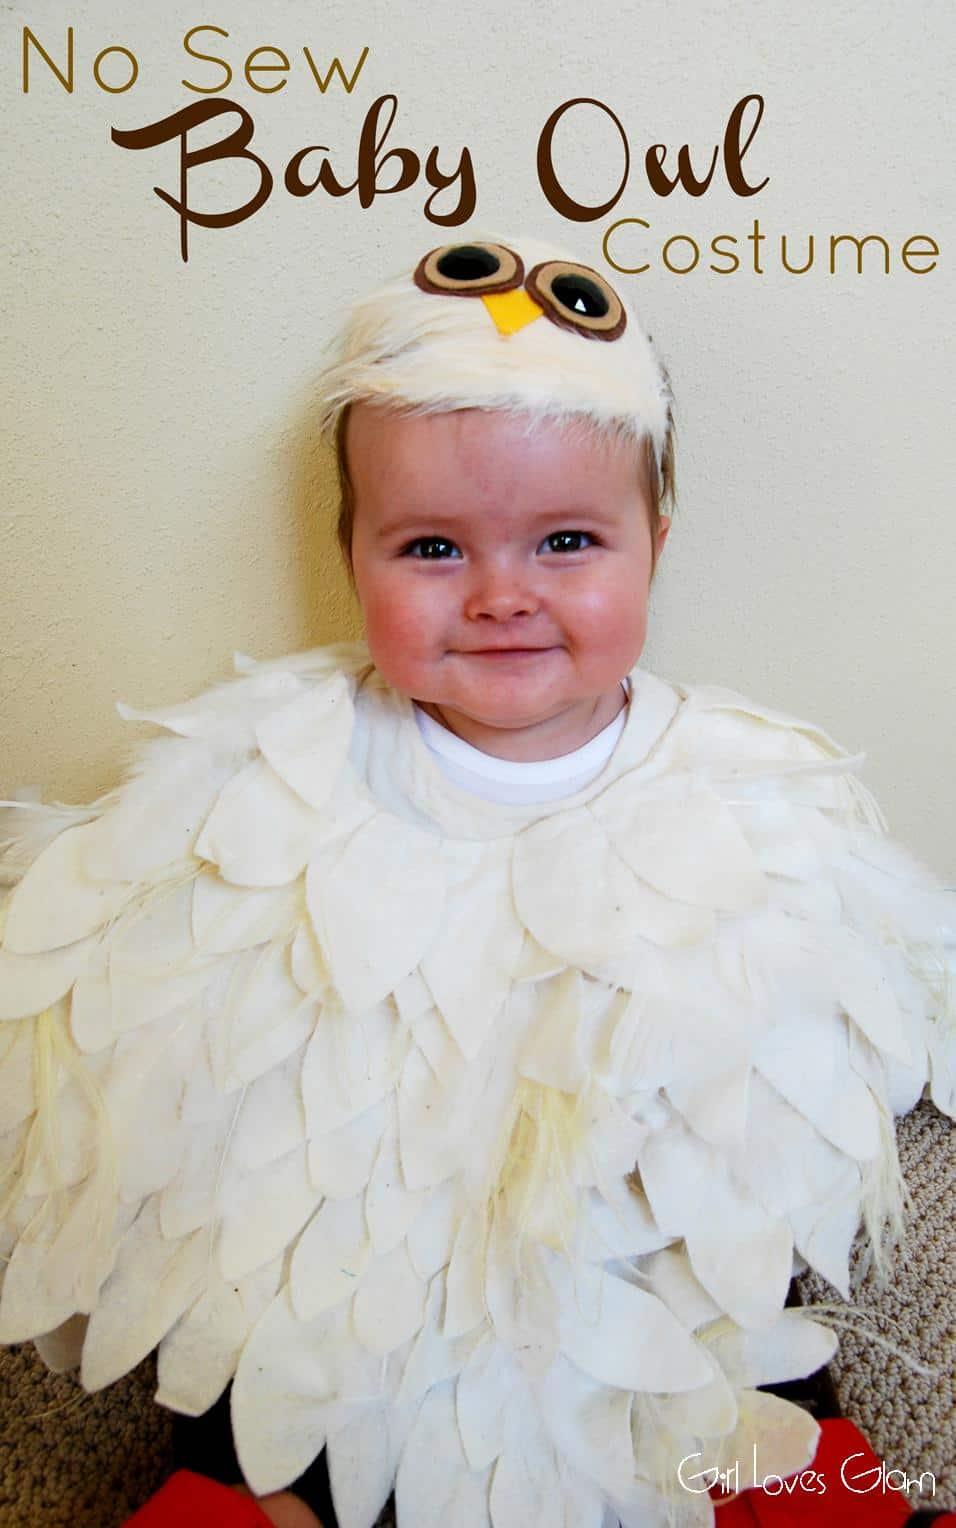 No Sew Baby Owl Costume